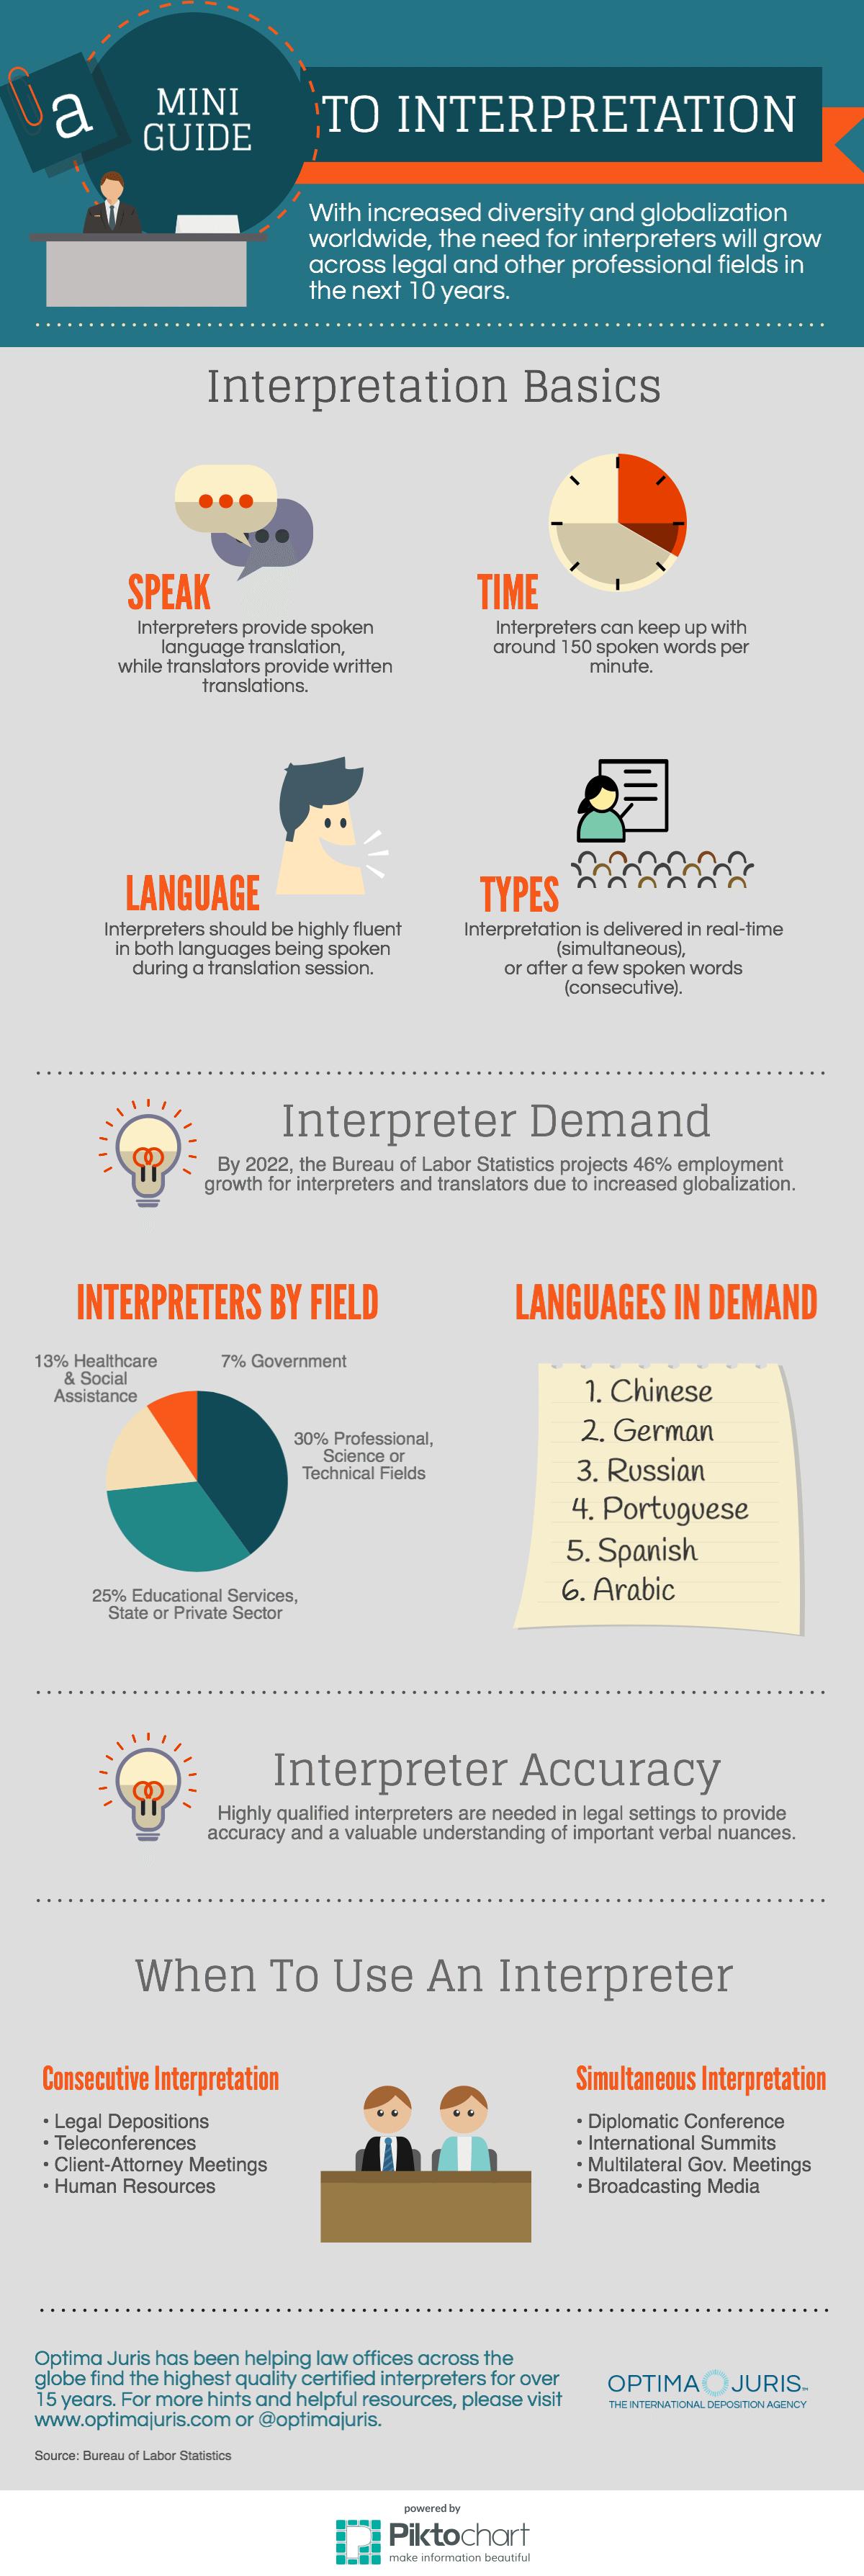 Mini Guide to Interpretation for International Depositions